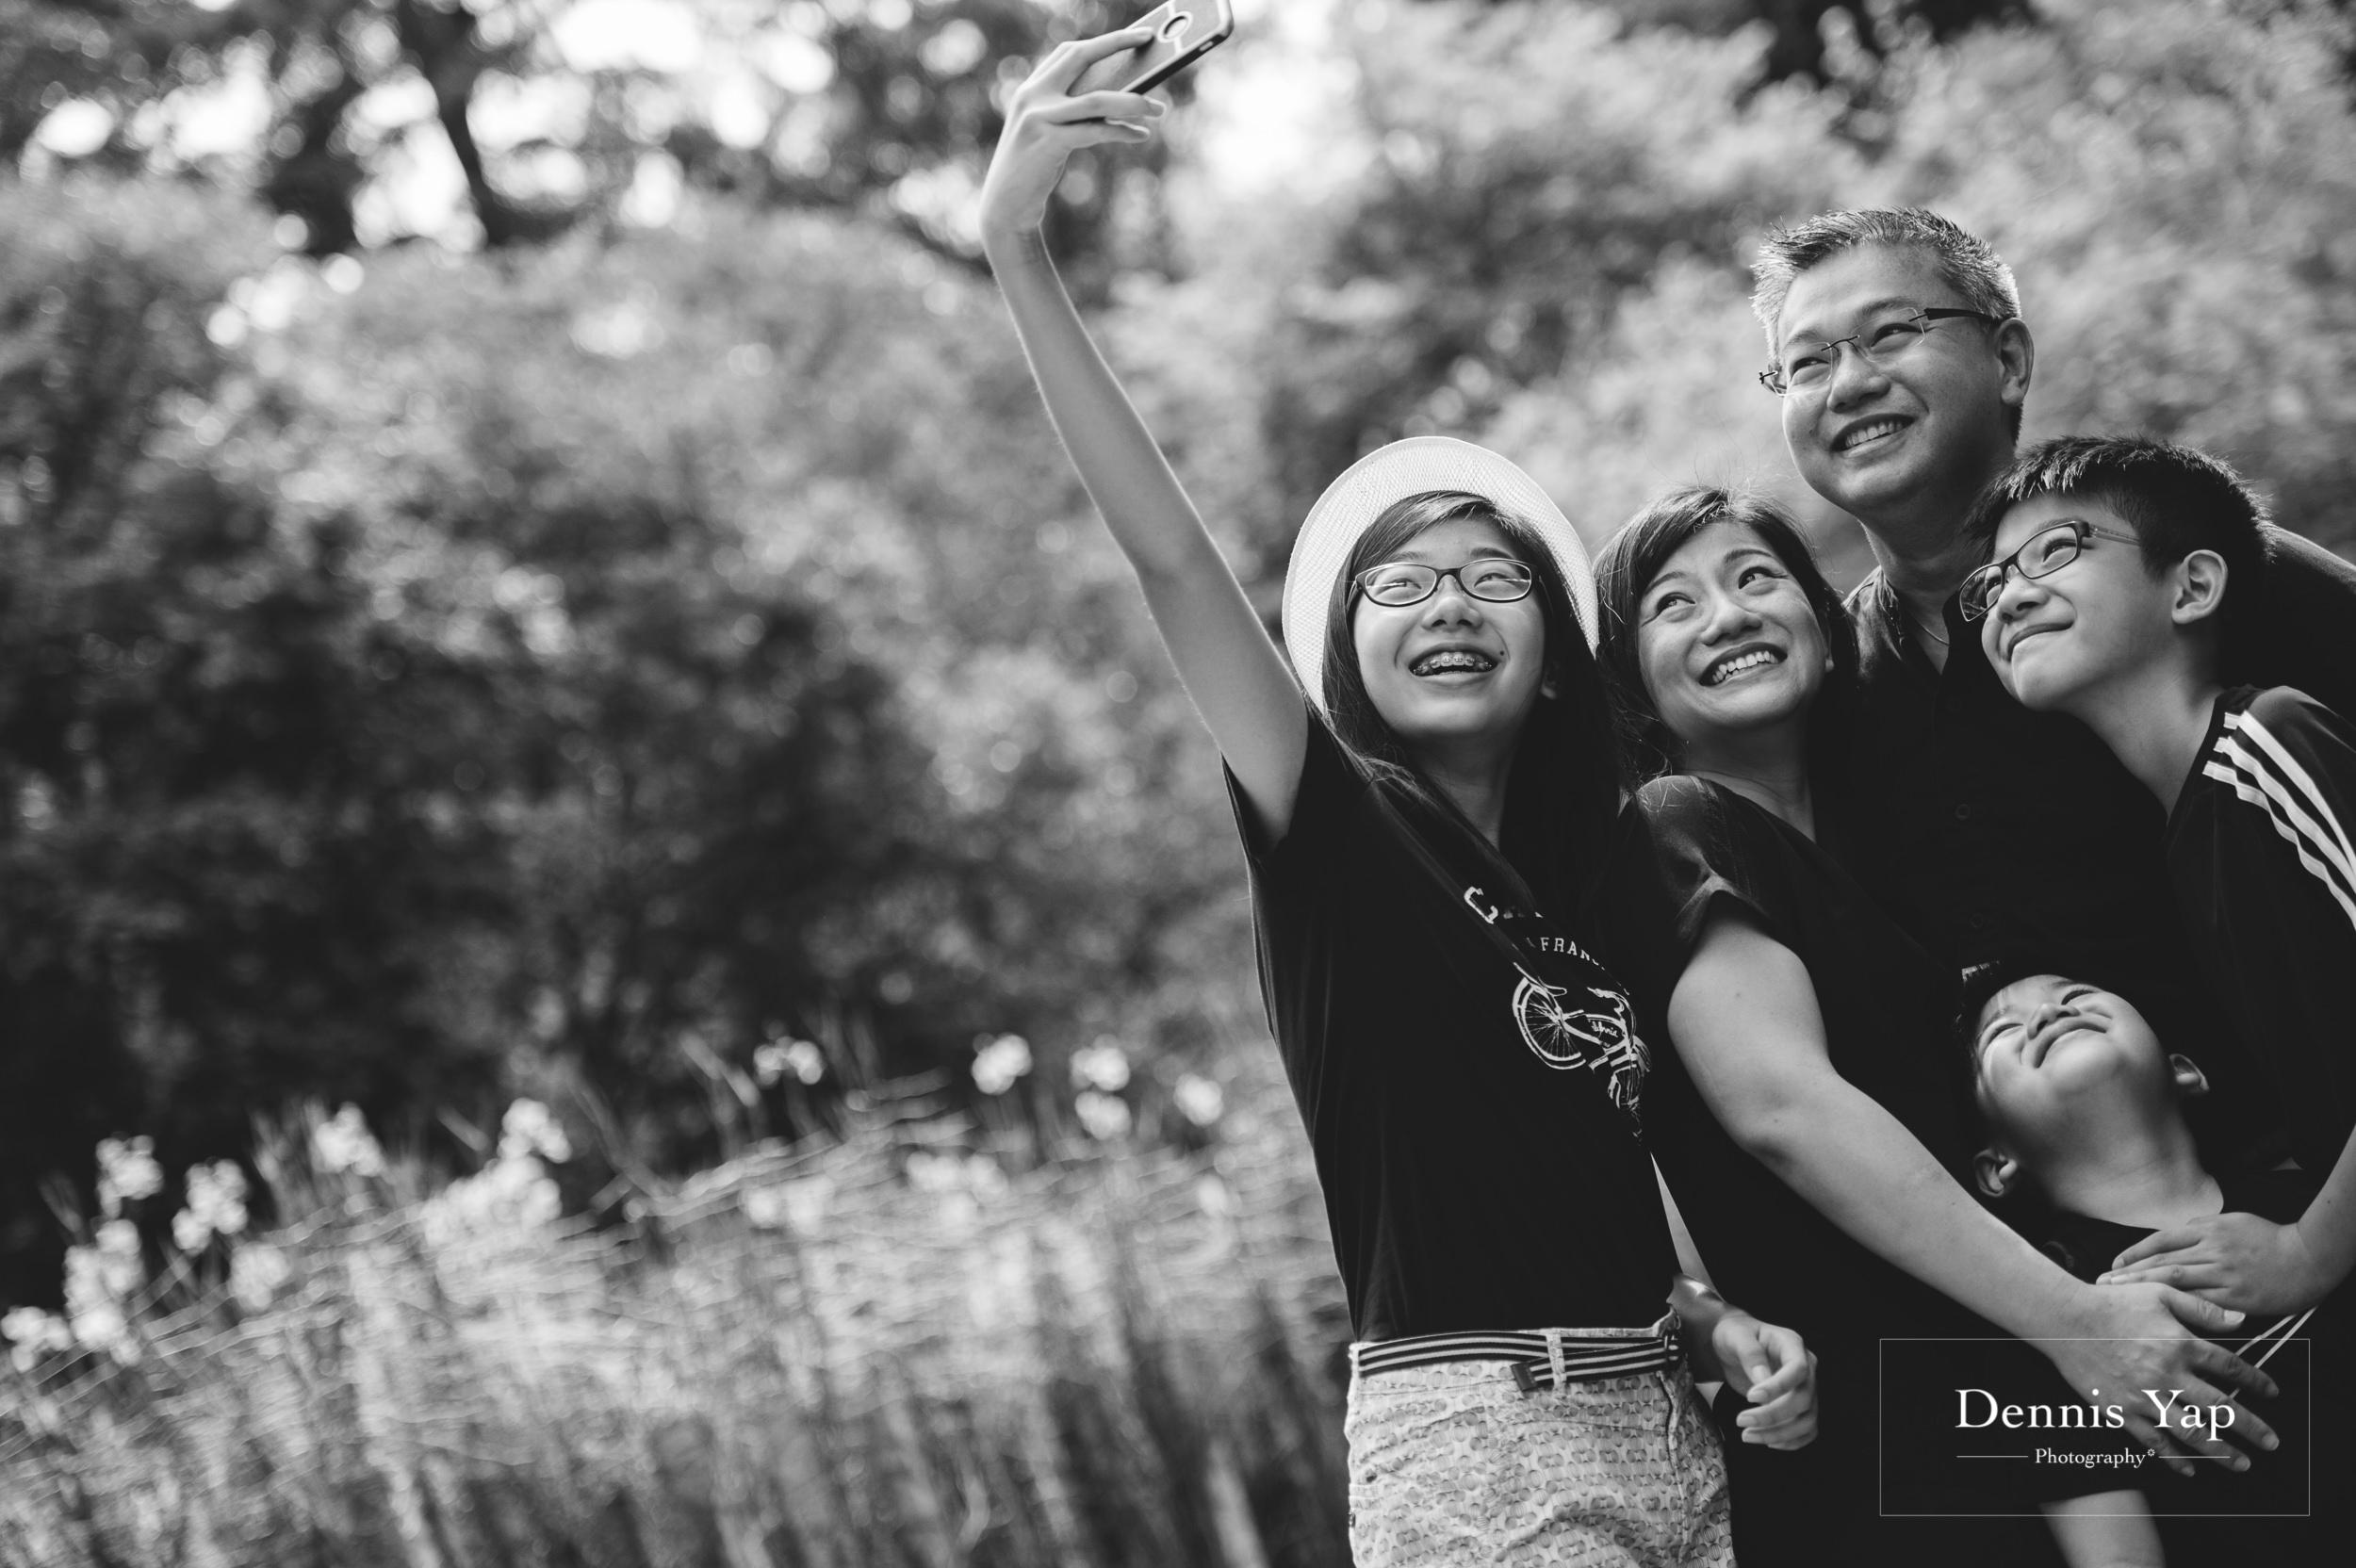 mai yin family portrait singapore botanical garden dennis yap photography malaysia-10.jpg